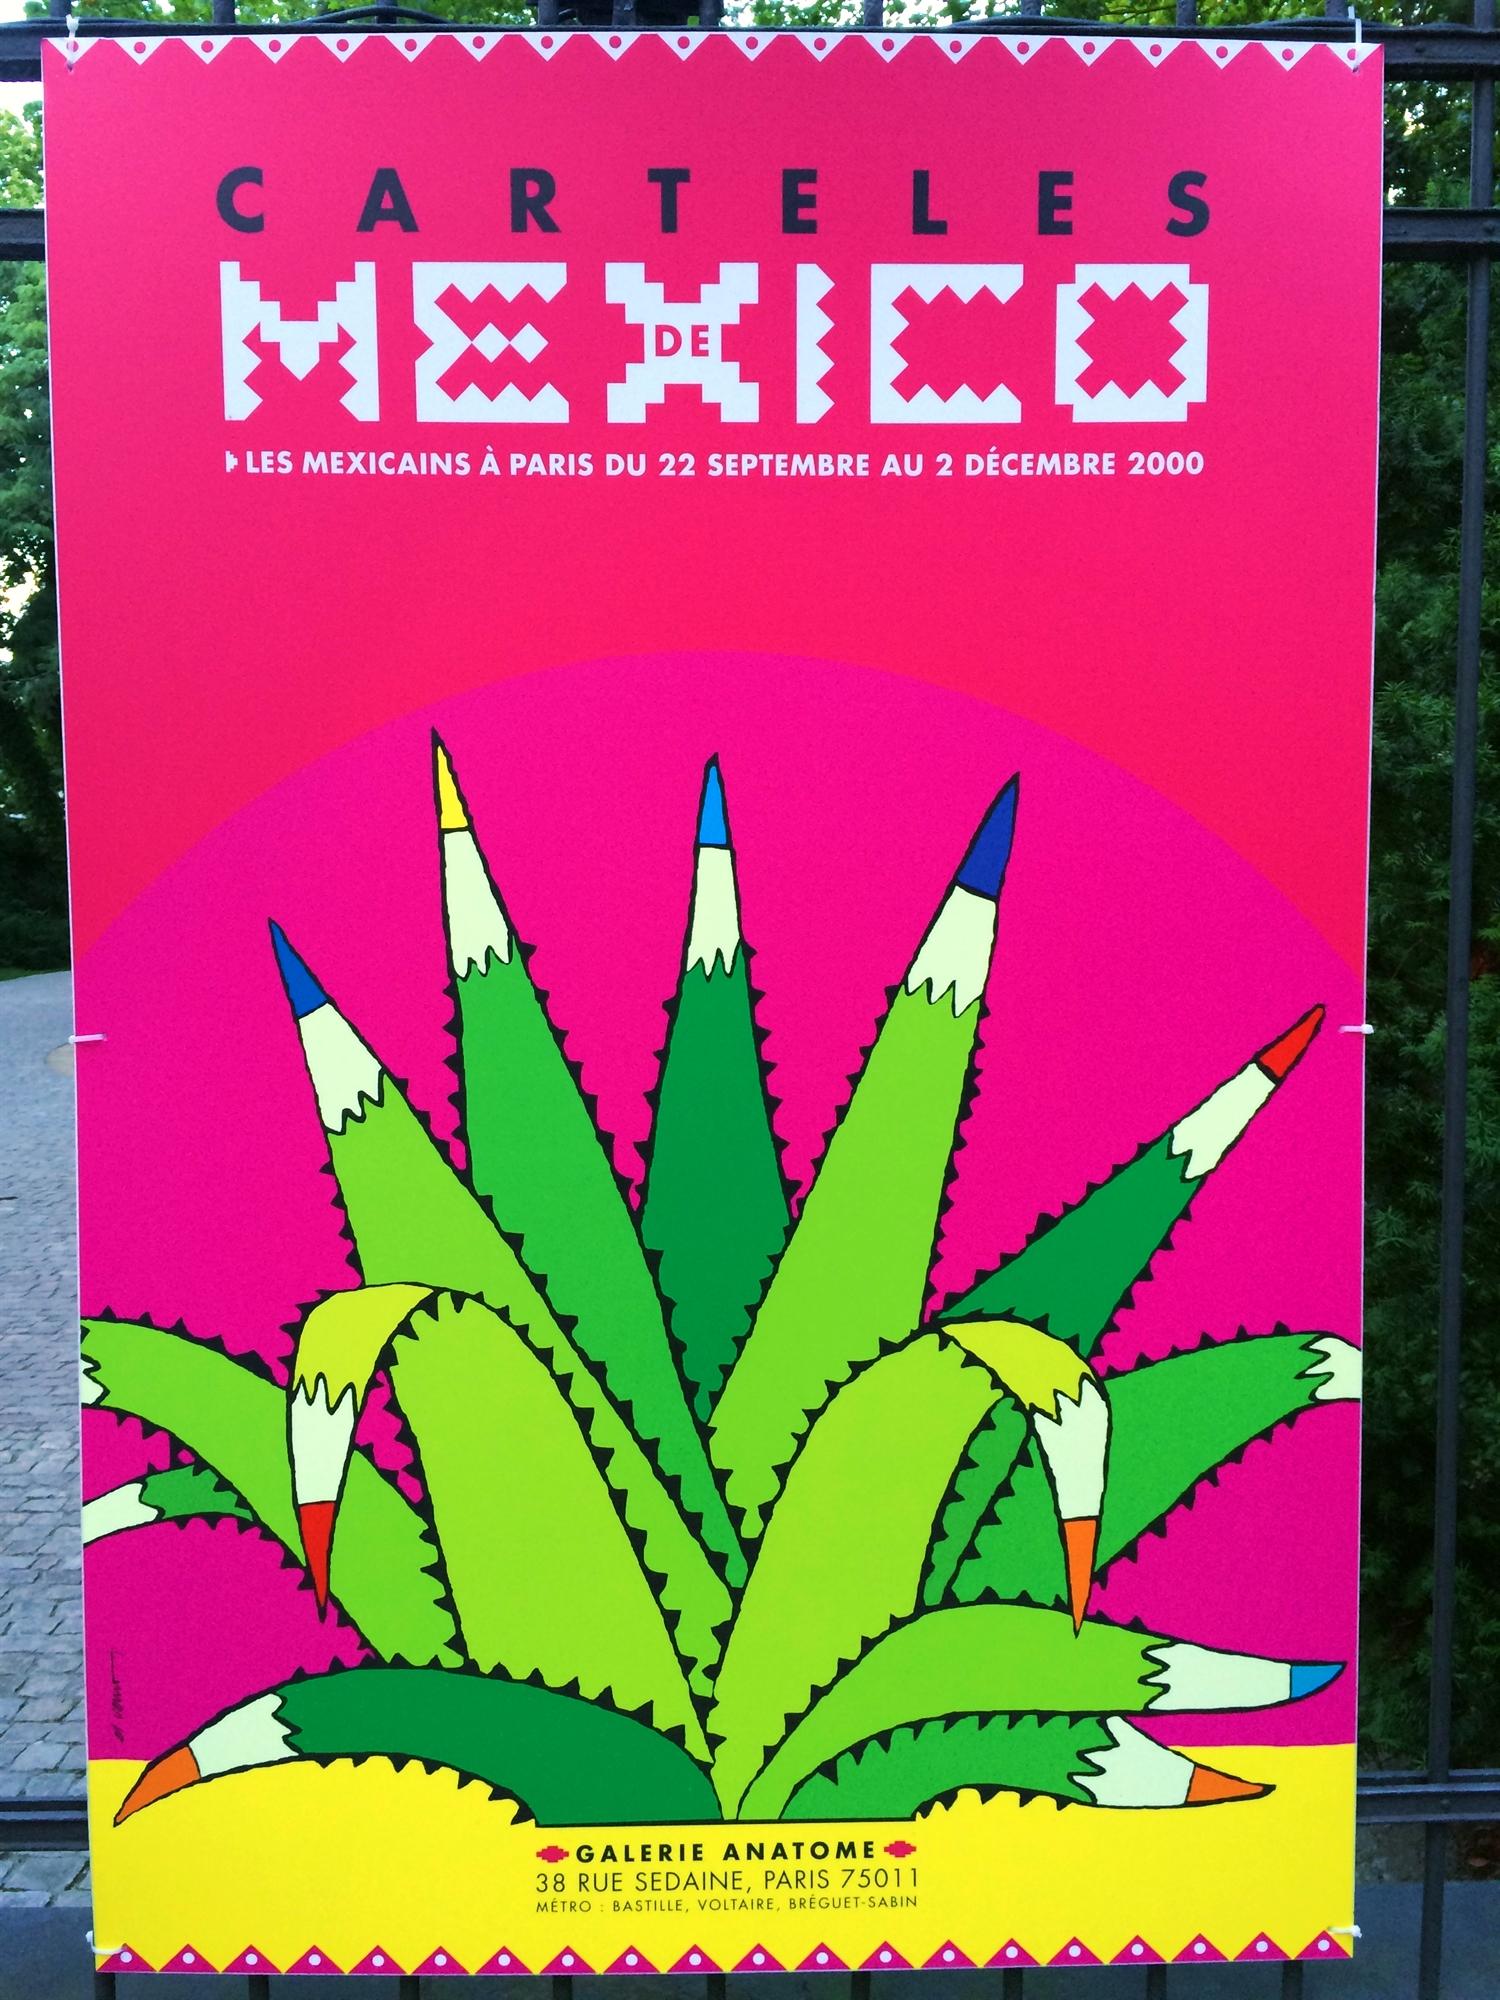 6 Mexican poster street art design plakat meksykanski projektowanie uzytkowe sztuka uliczna FORelementspl